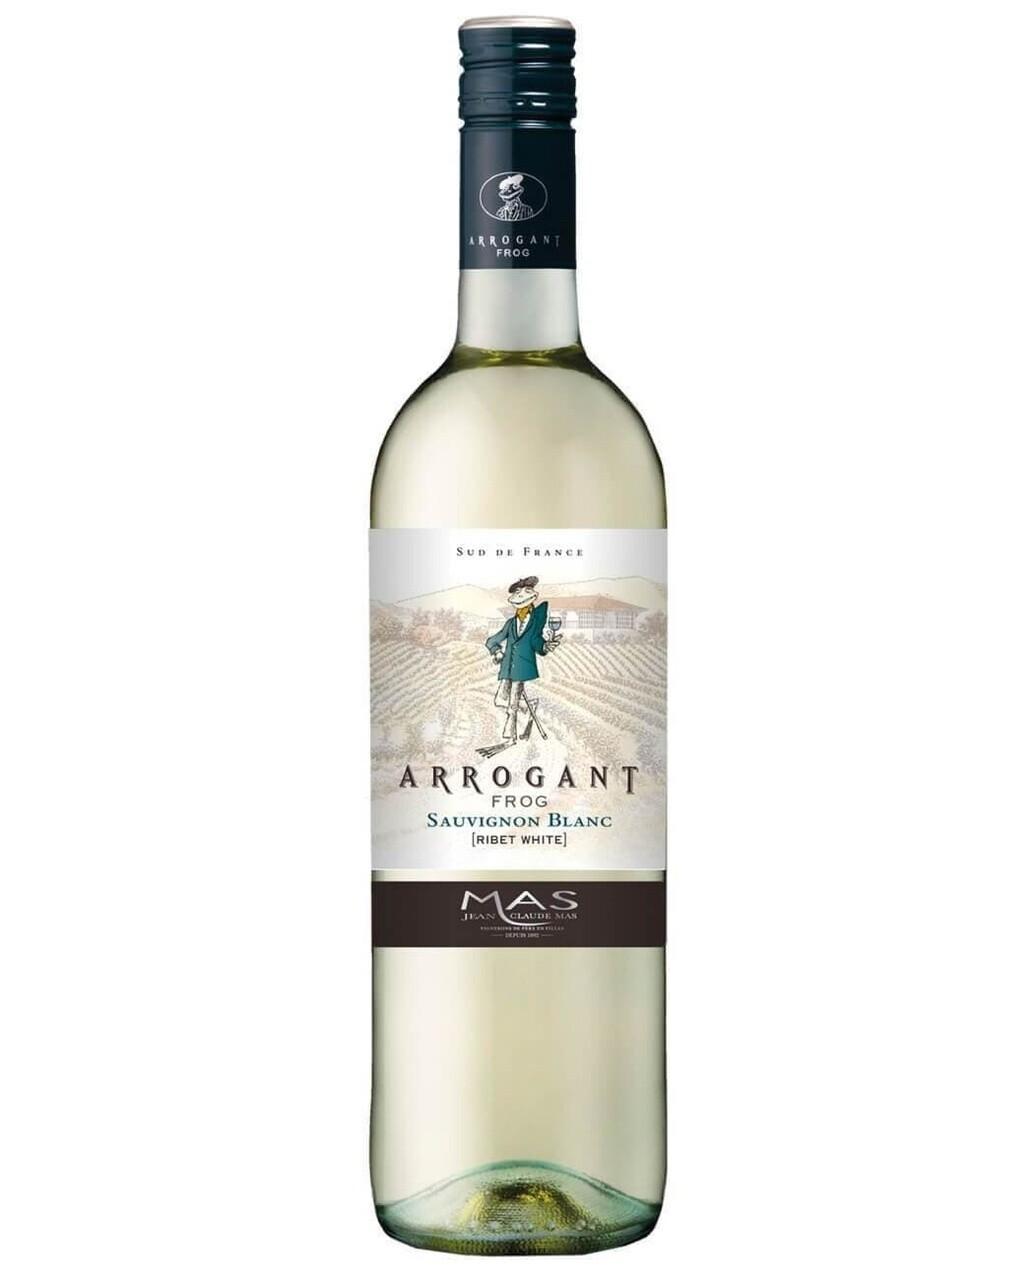 Arrogant Frog Ribet White Sauvignon Blanc